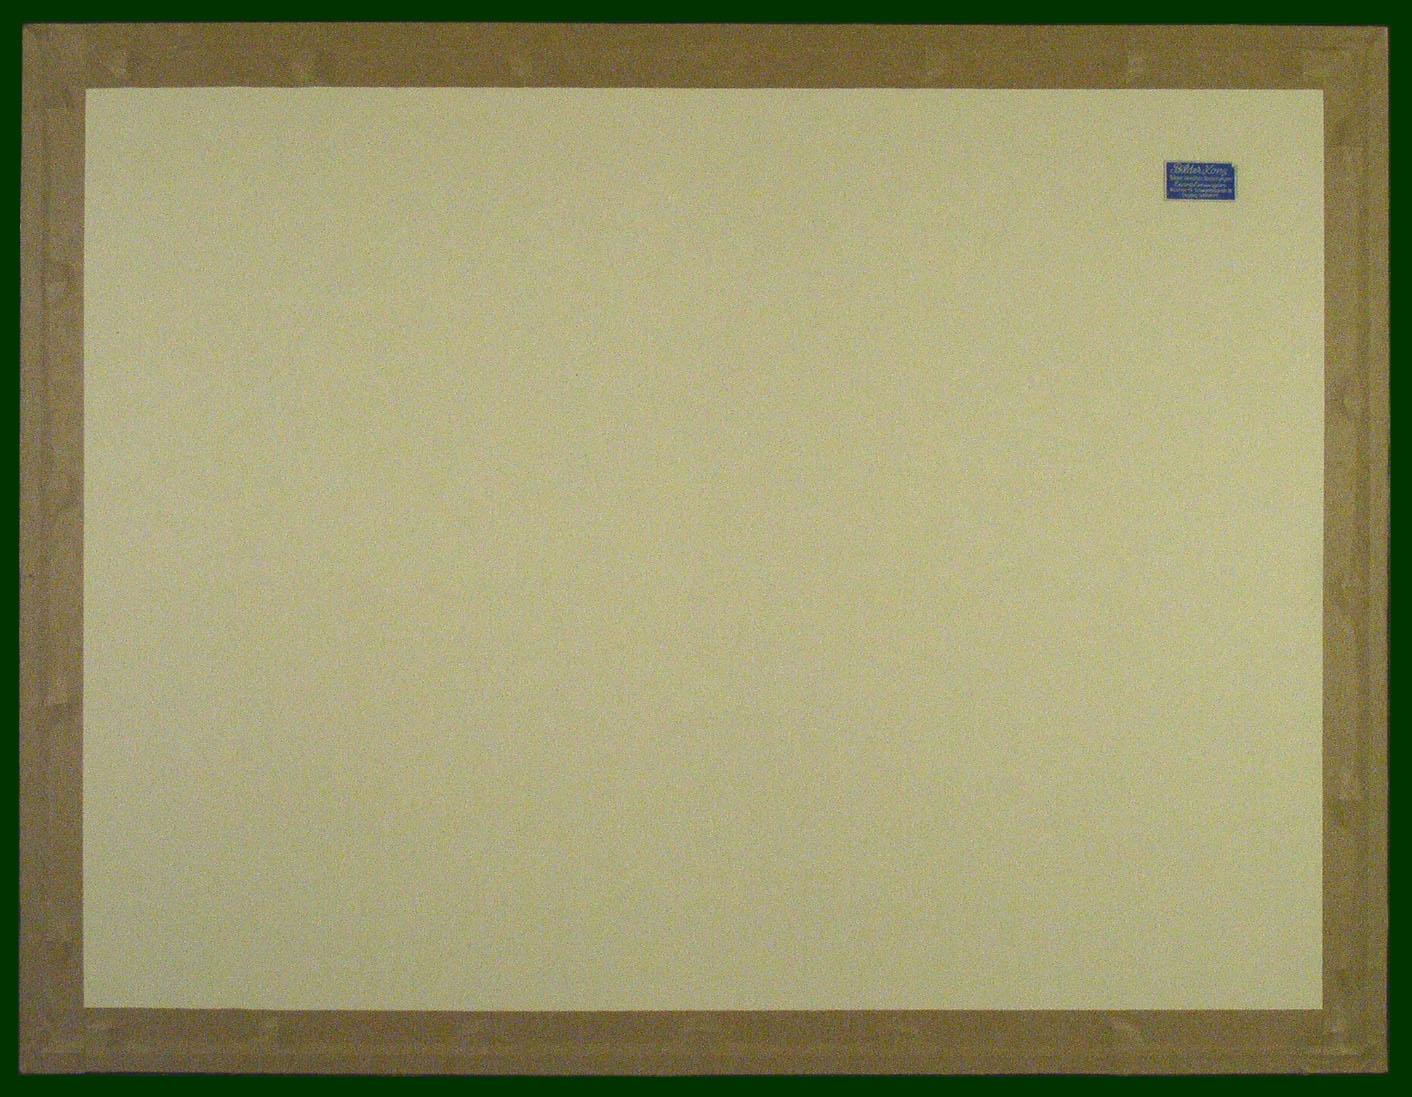 56-8hat.JPG (1412×1097)